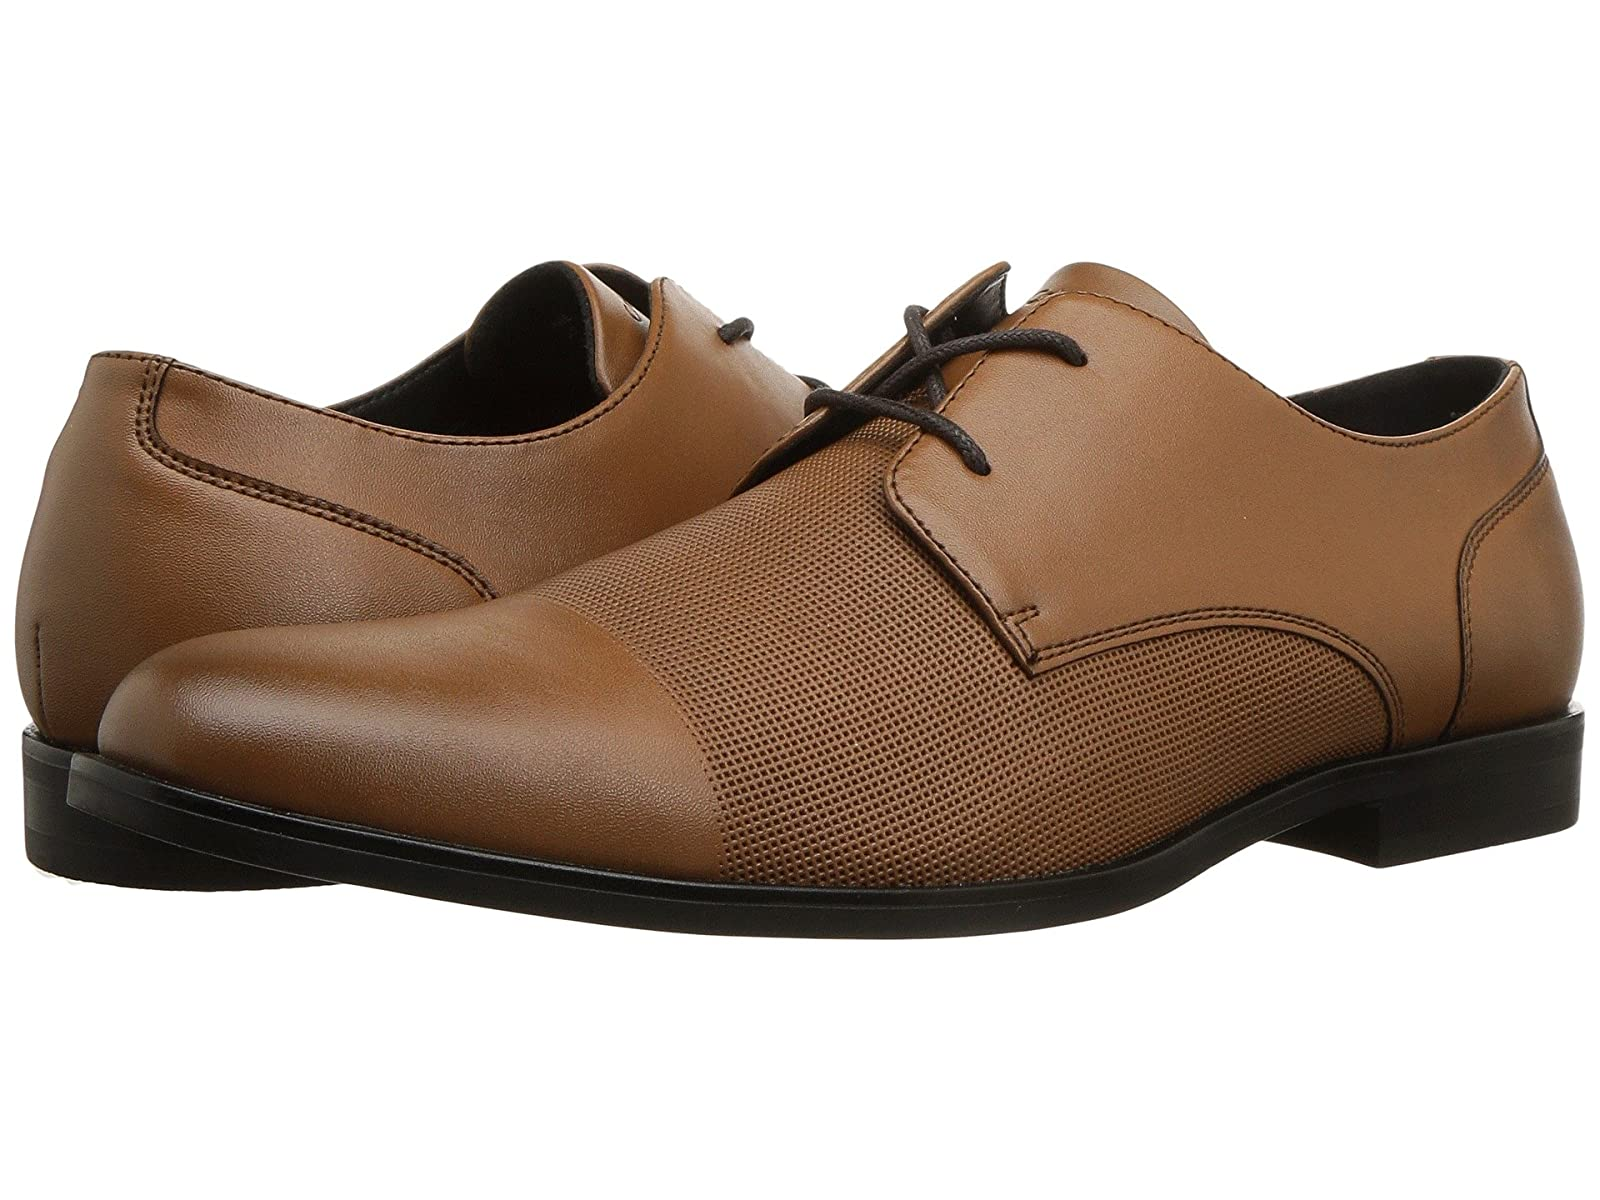 Calvin Klein AbelCheap and distinctive eye-catching shoes